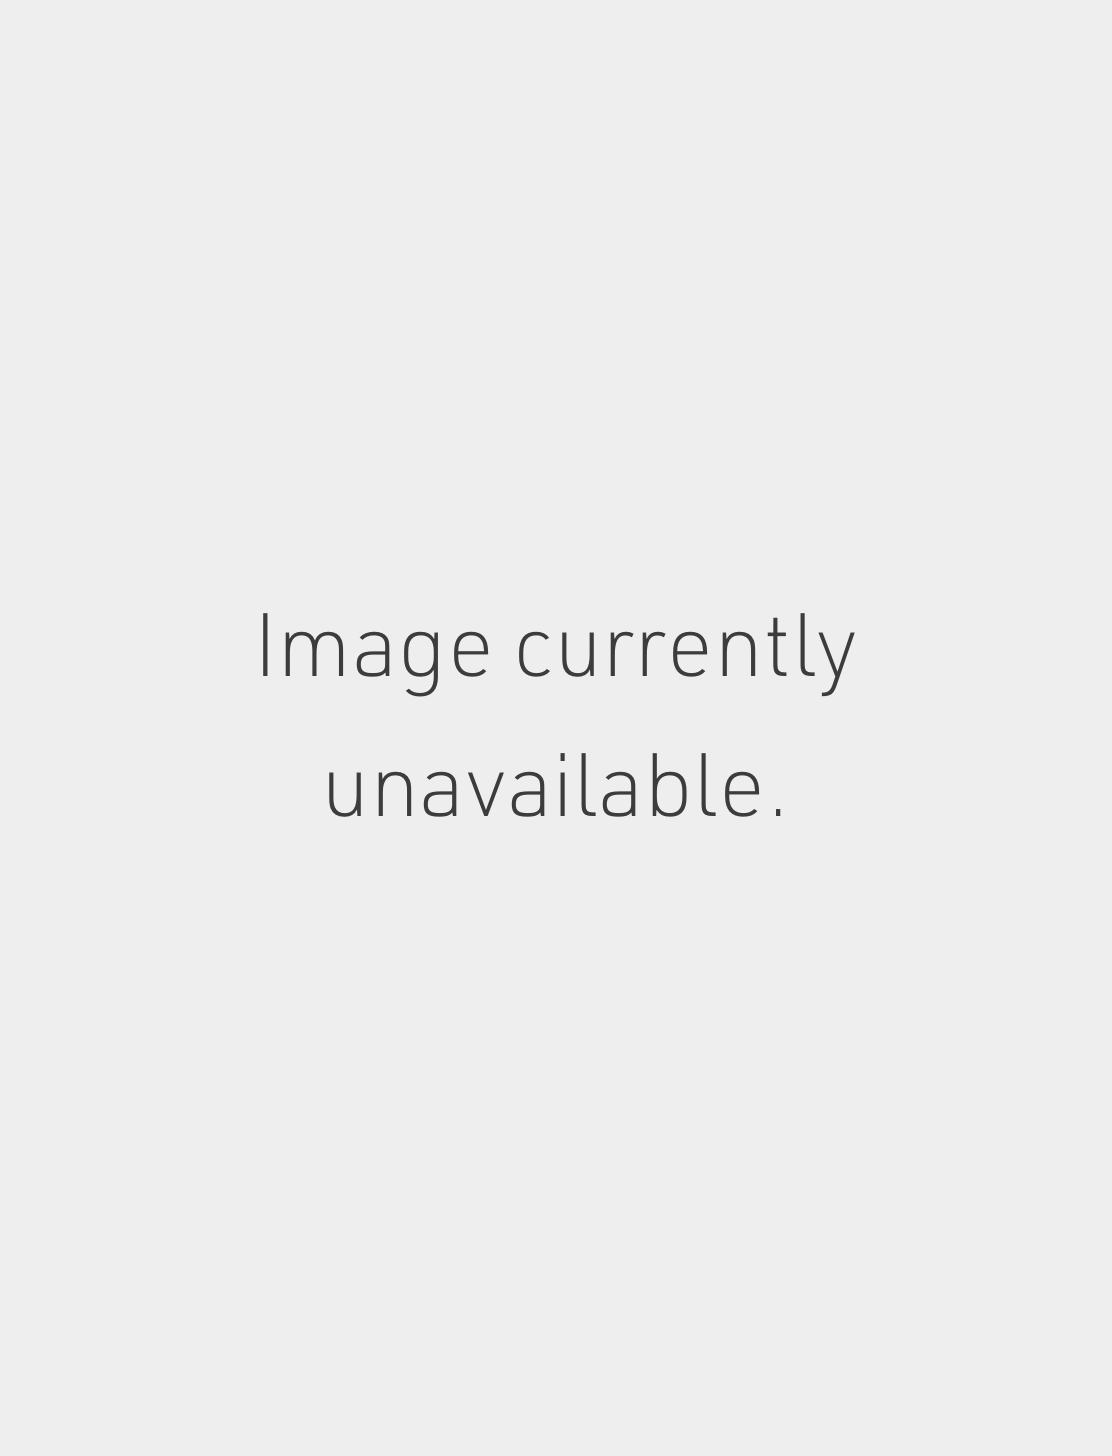 14k Bezel Set Vintage Eye Necklace Image #1